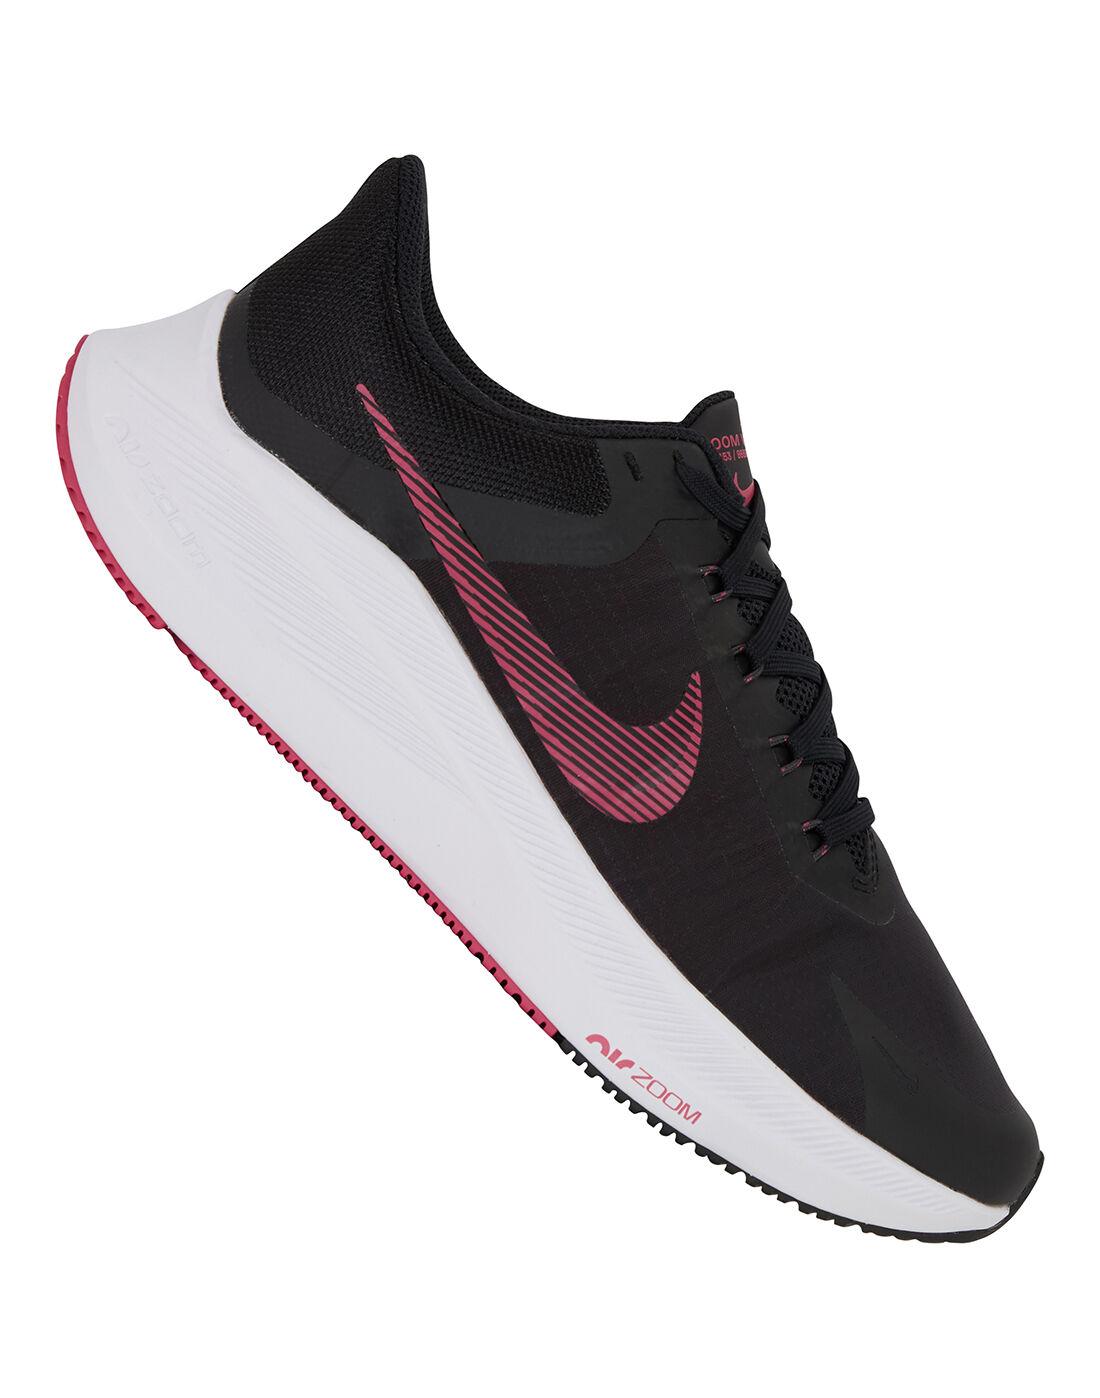 adidas shoe care